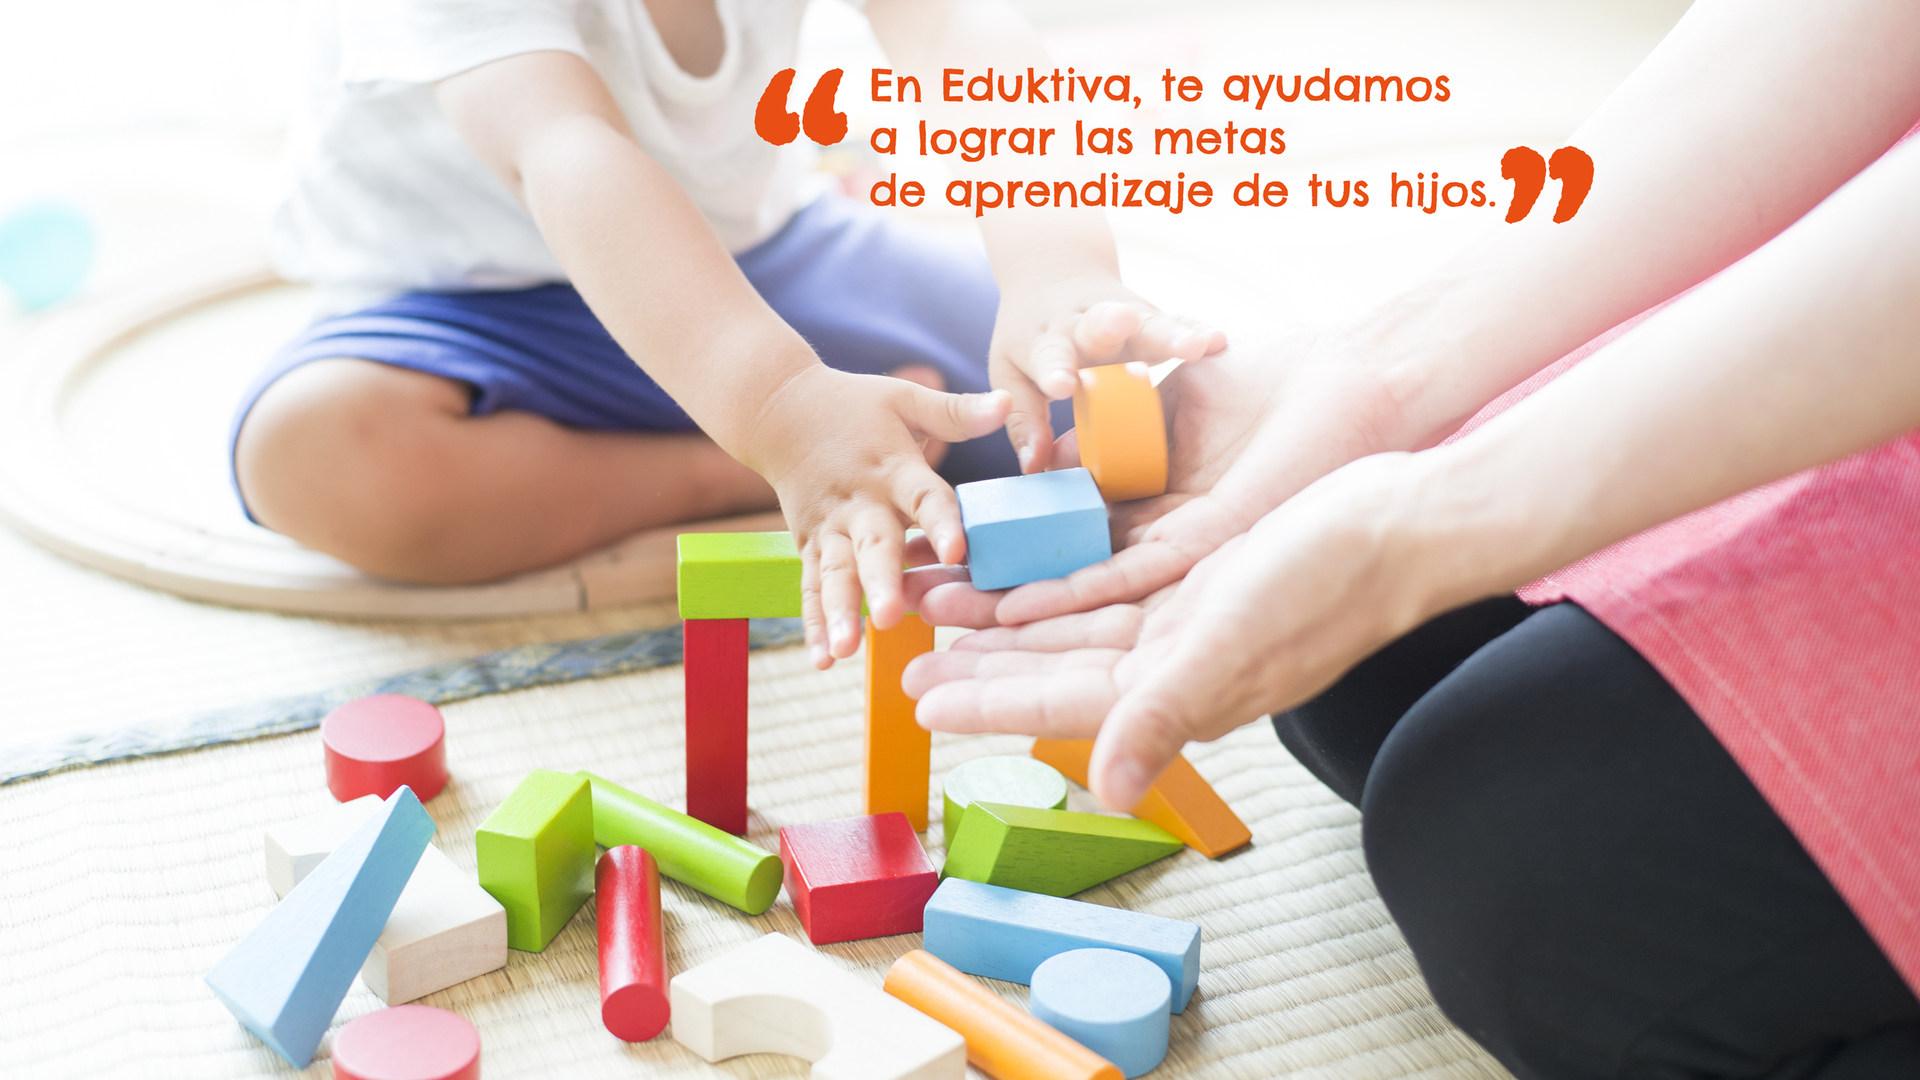 En Eduktiva, te ayudamos a lograr las metas de aprendizaje de tus hijos.